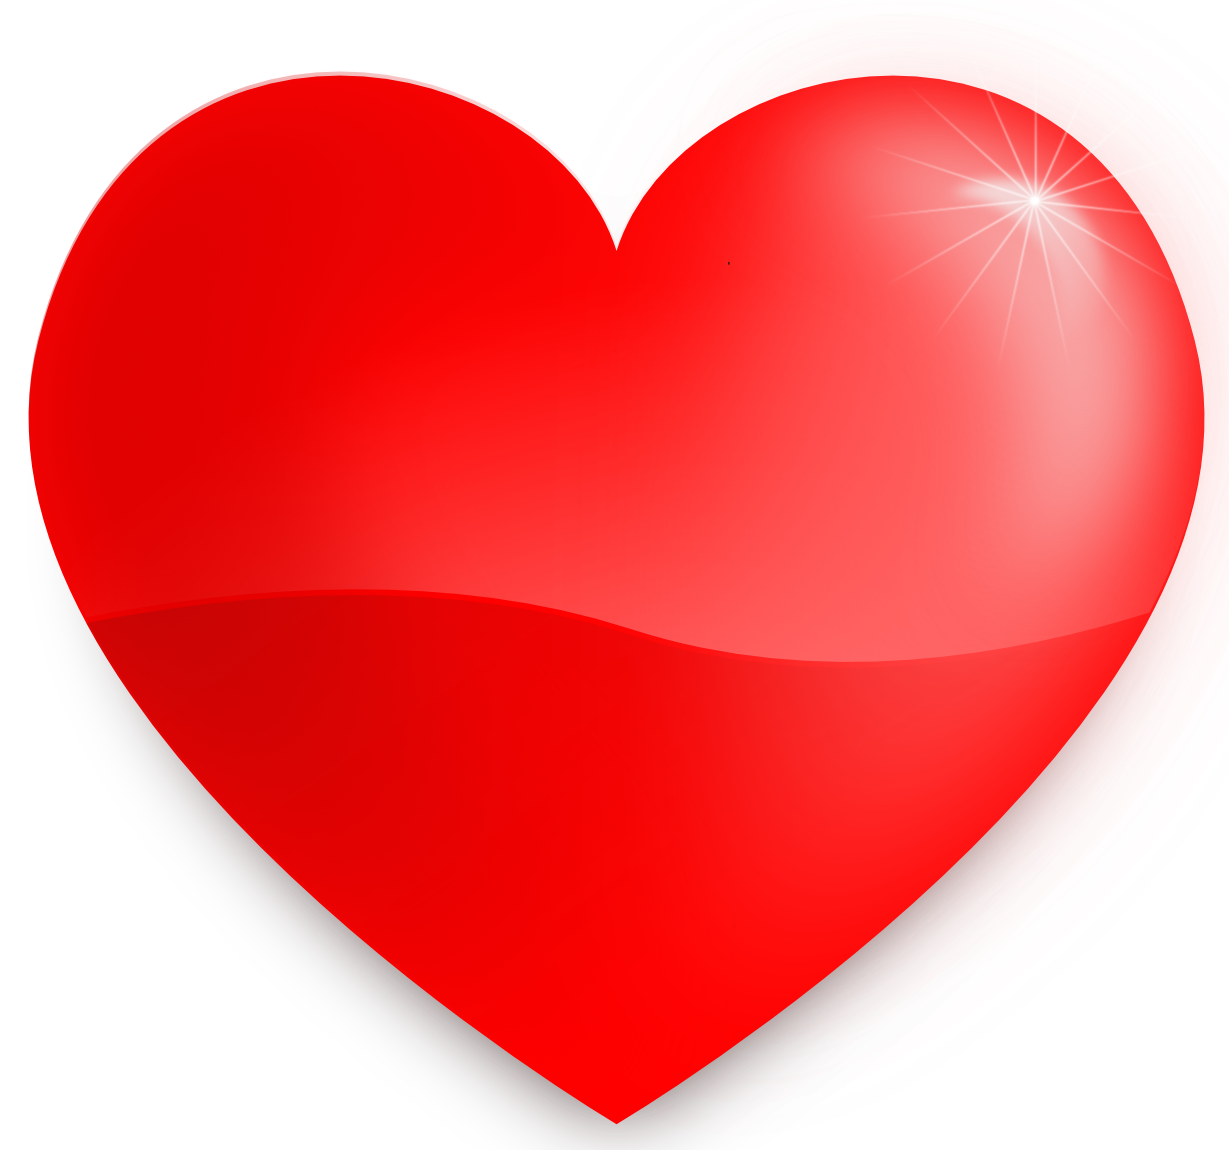 The Happy Valentine's Day Heart   Valentine Jinni